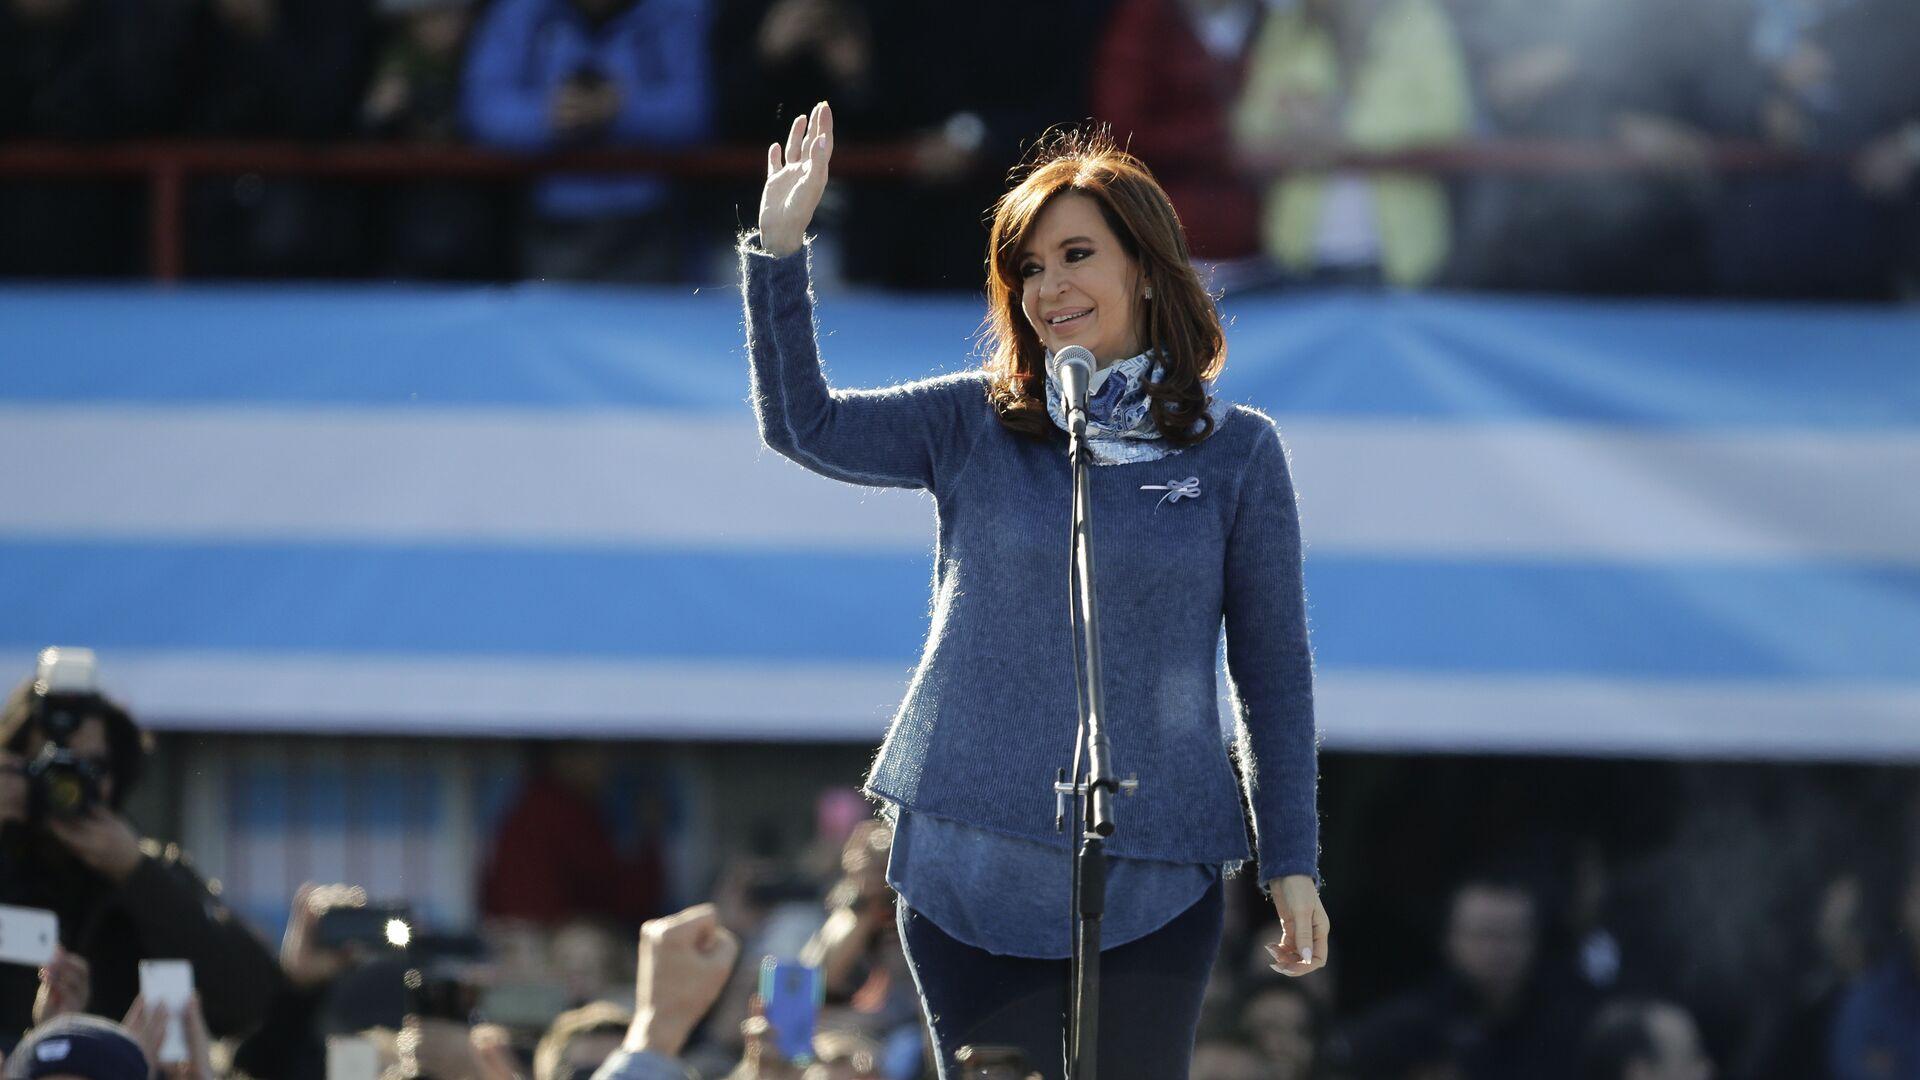 Cristina Fernández de Kirchner, expresidenta de Argentina - Sputnik Mundo, 1920, 13.04.2021